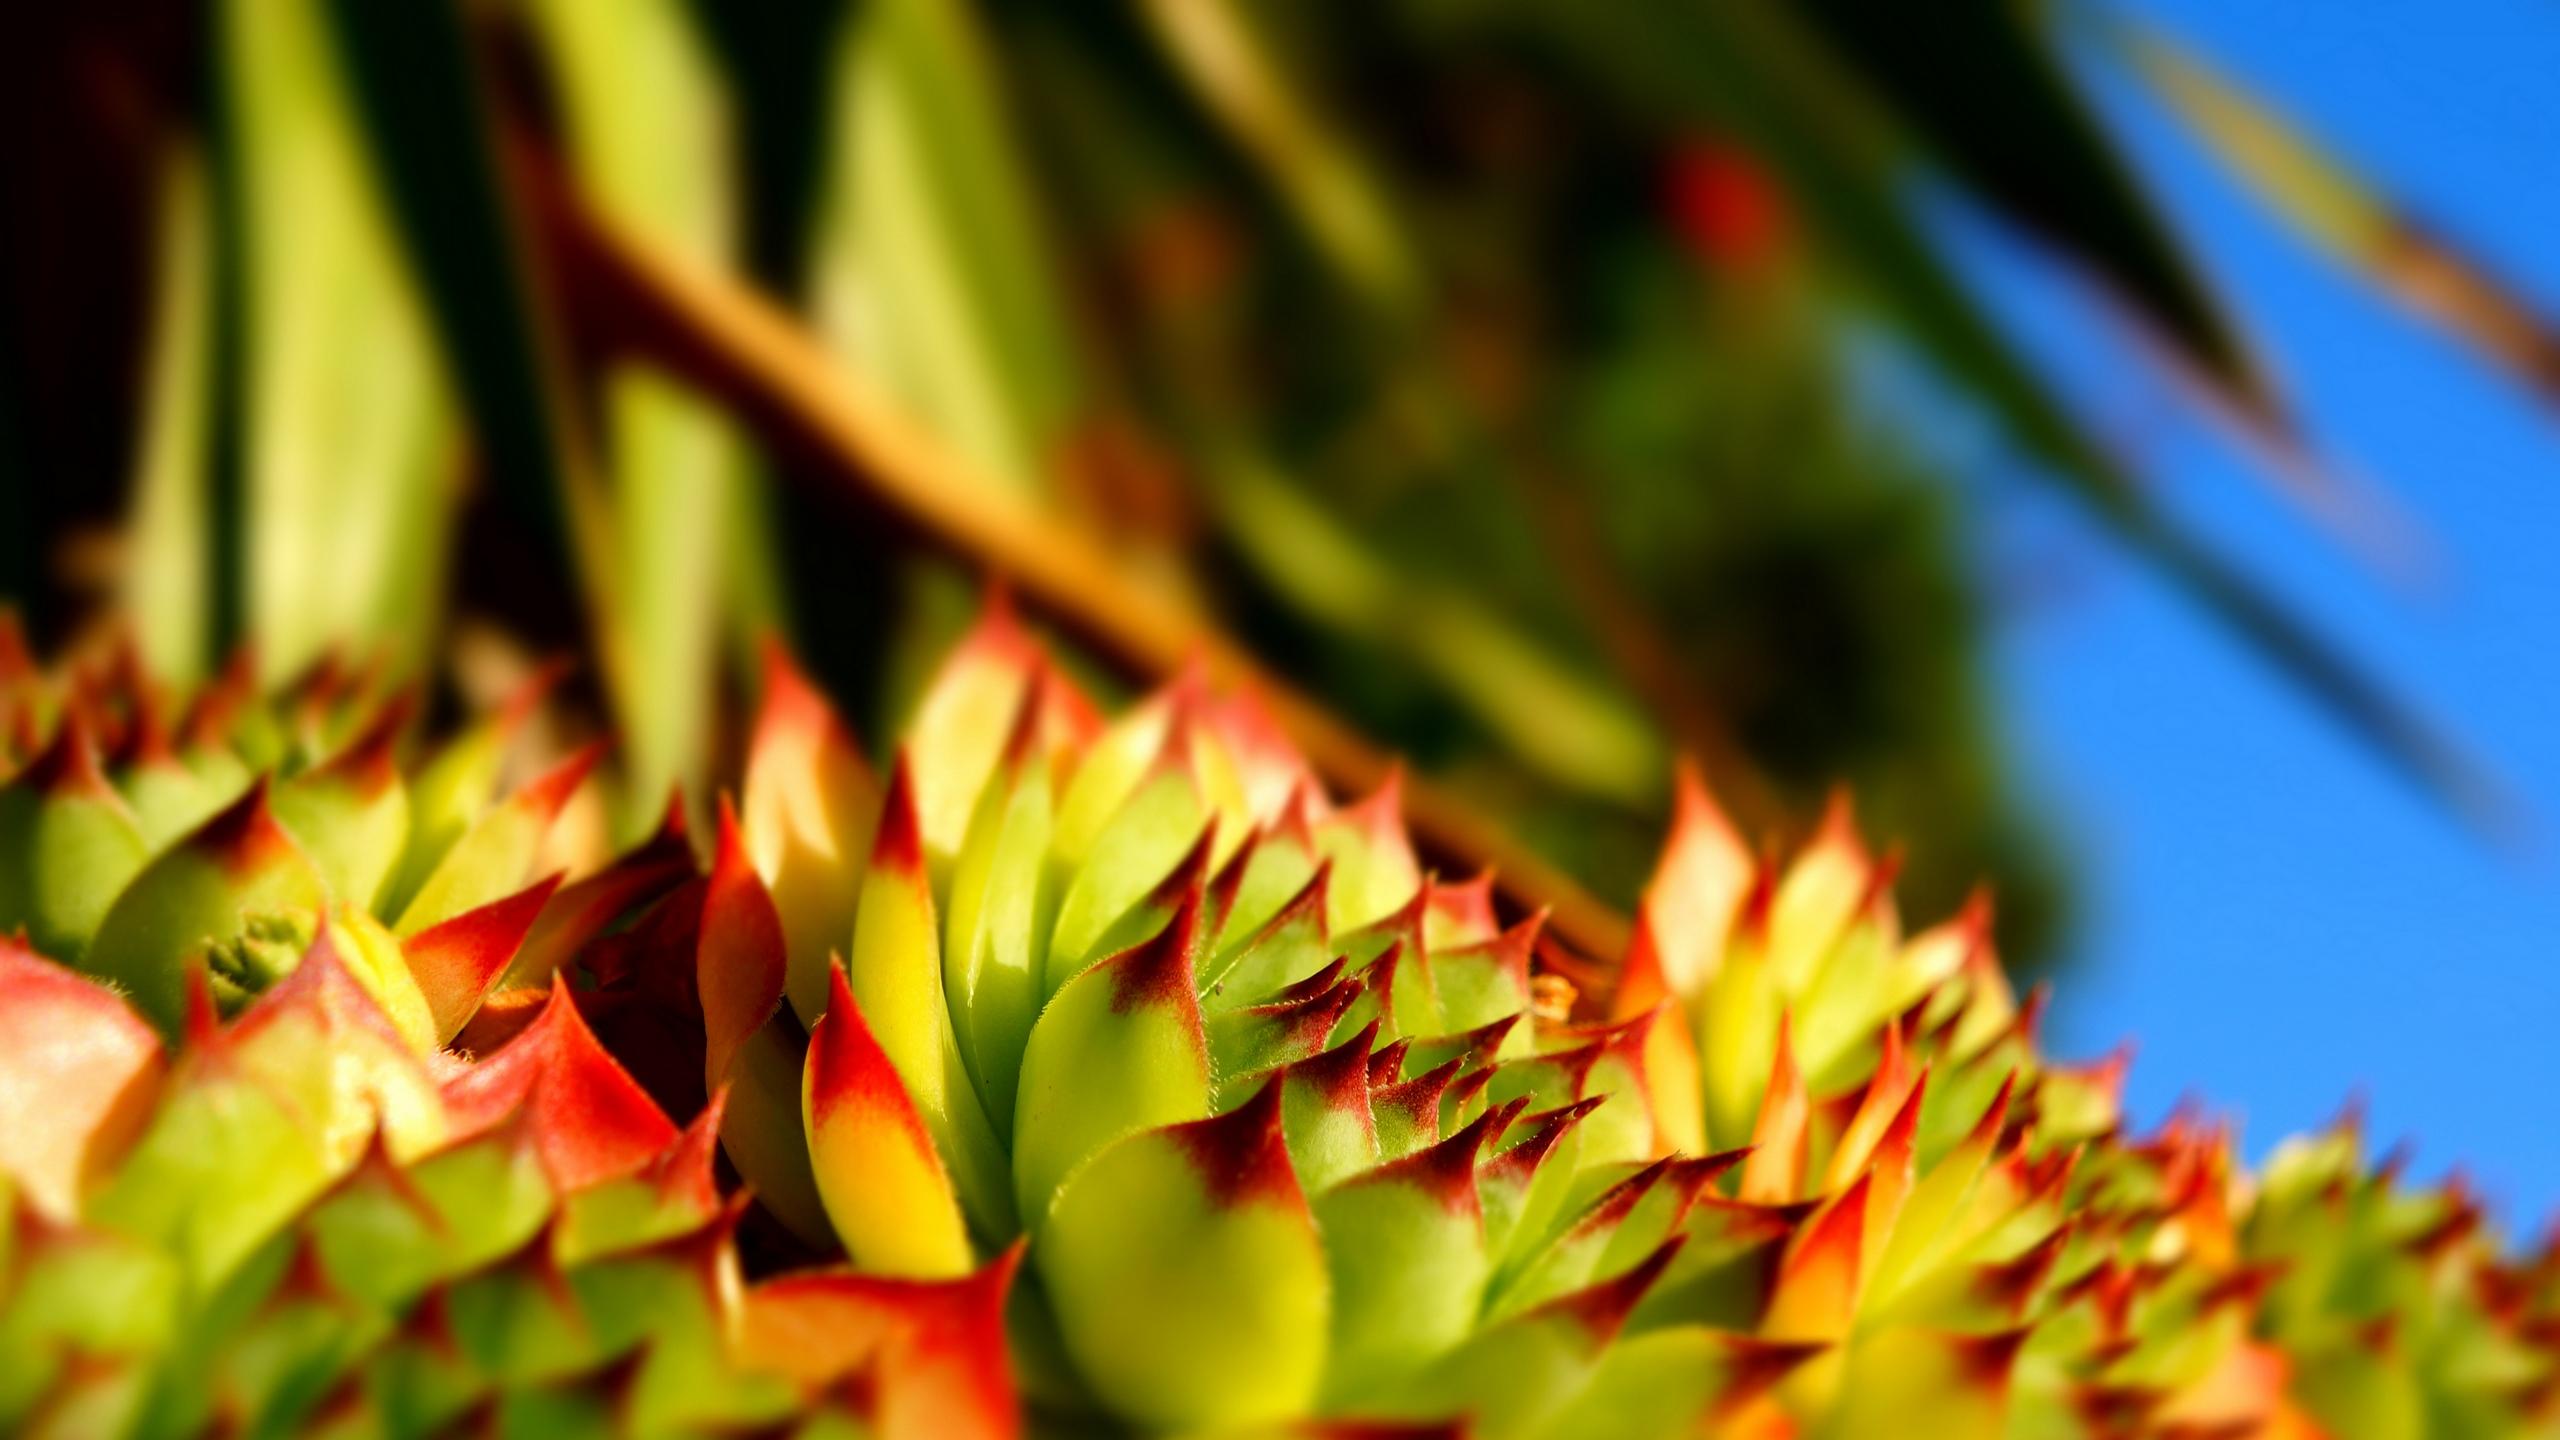 Fonds d'écran Nature Plantes grasses